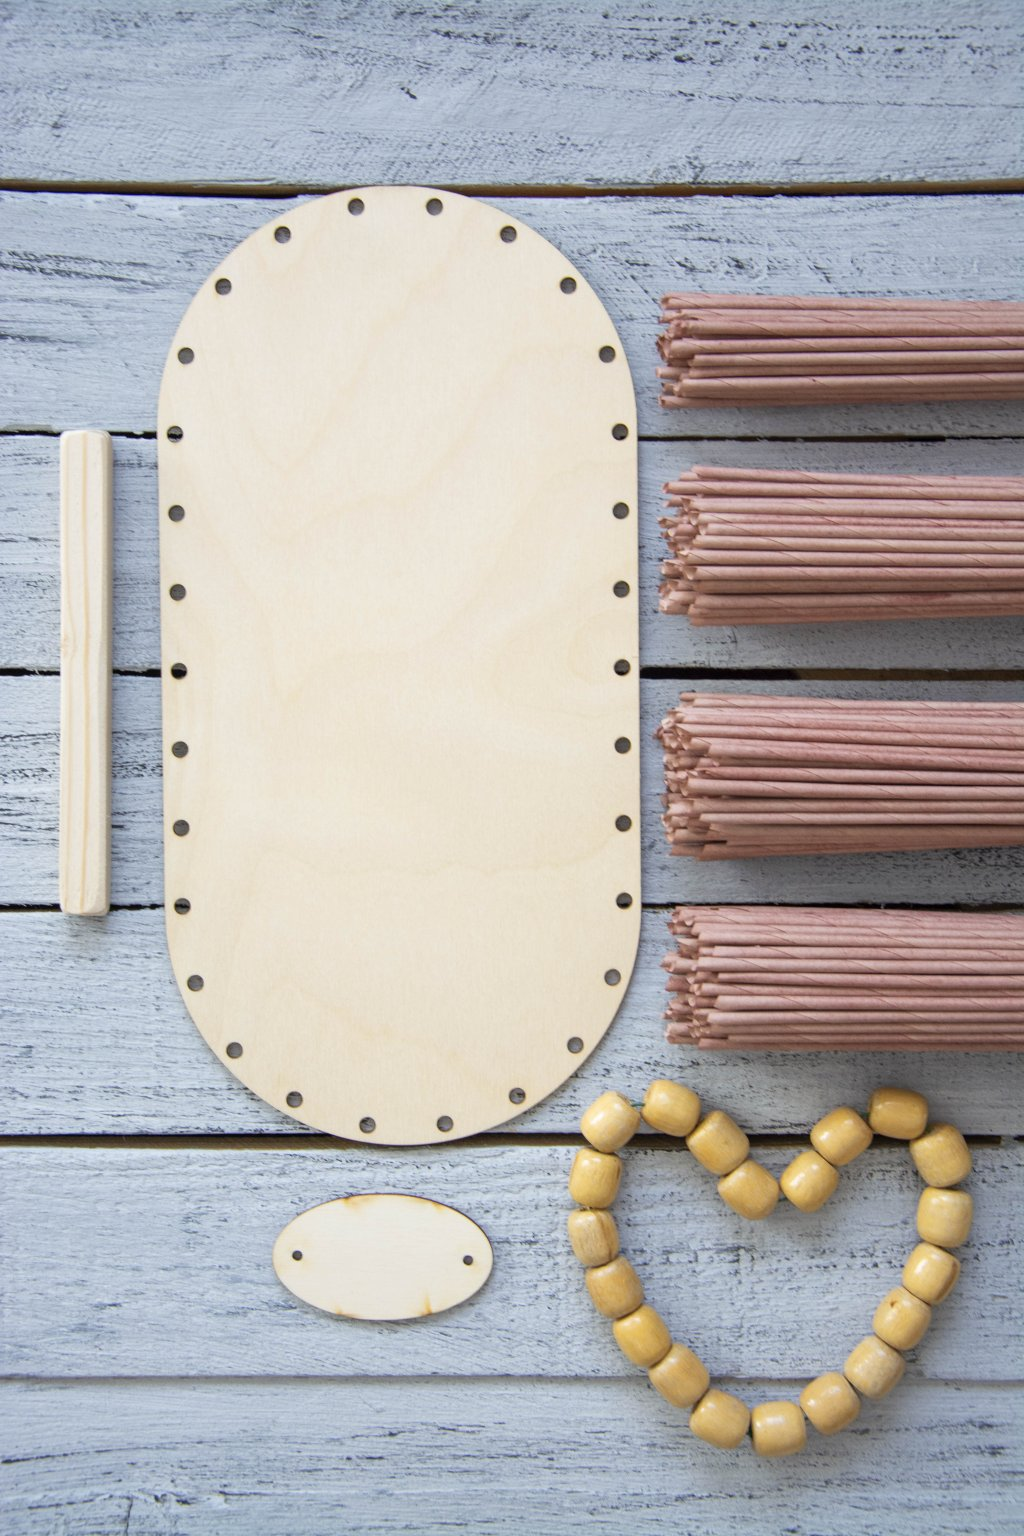 Sada na papírové pletení papírové ruličky a dřevěné dno